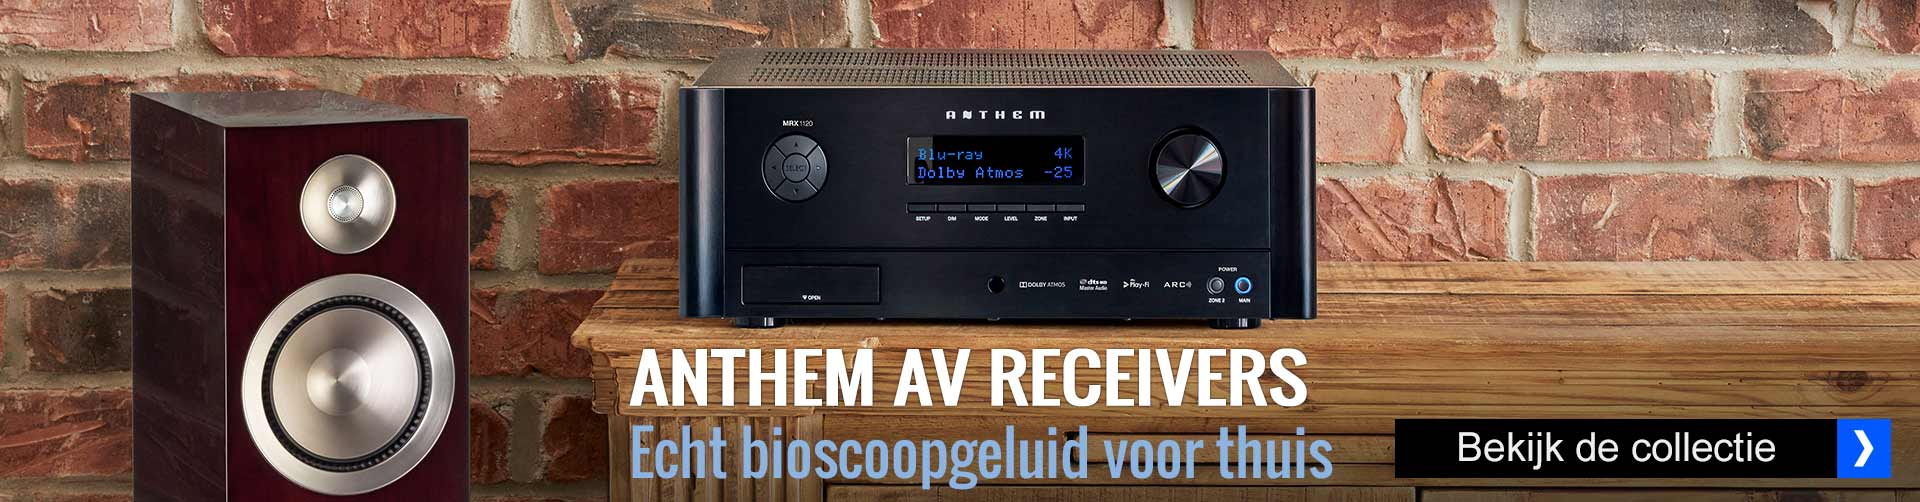 Anthem AV receivers bij HOBO hifi